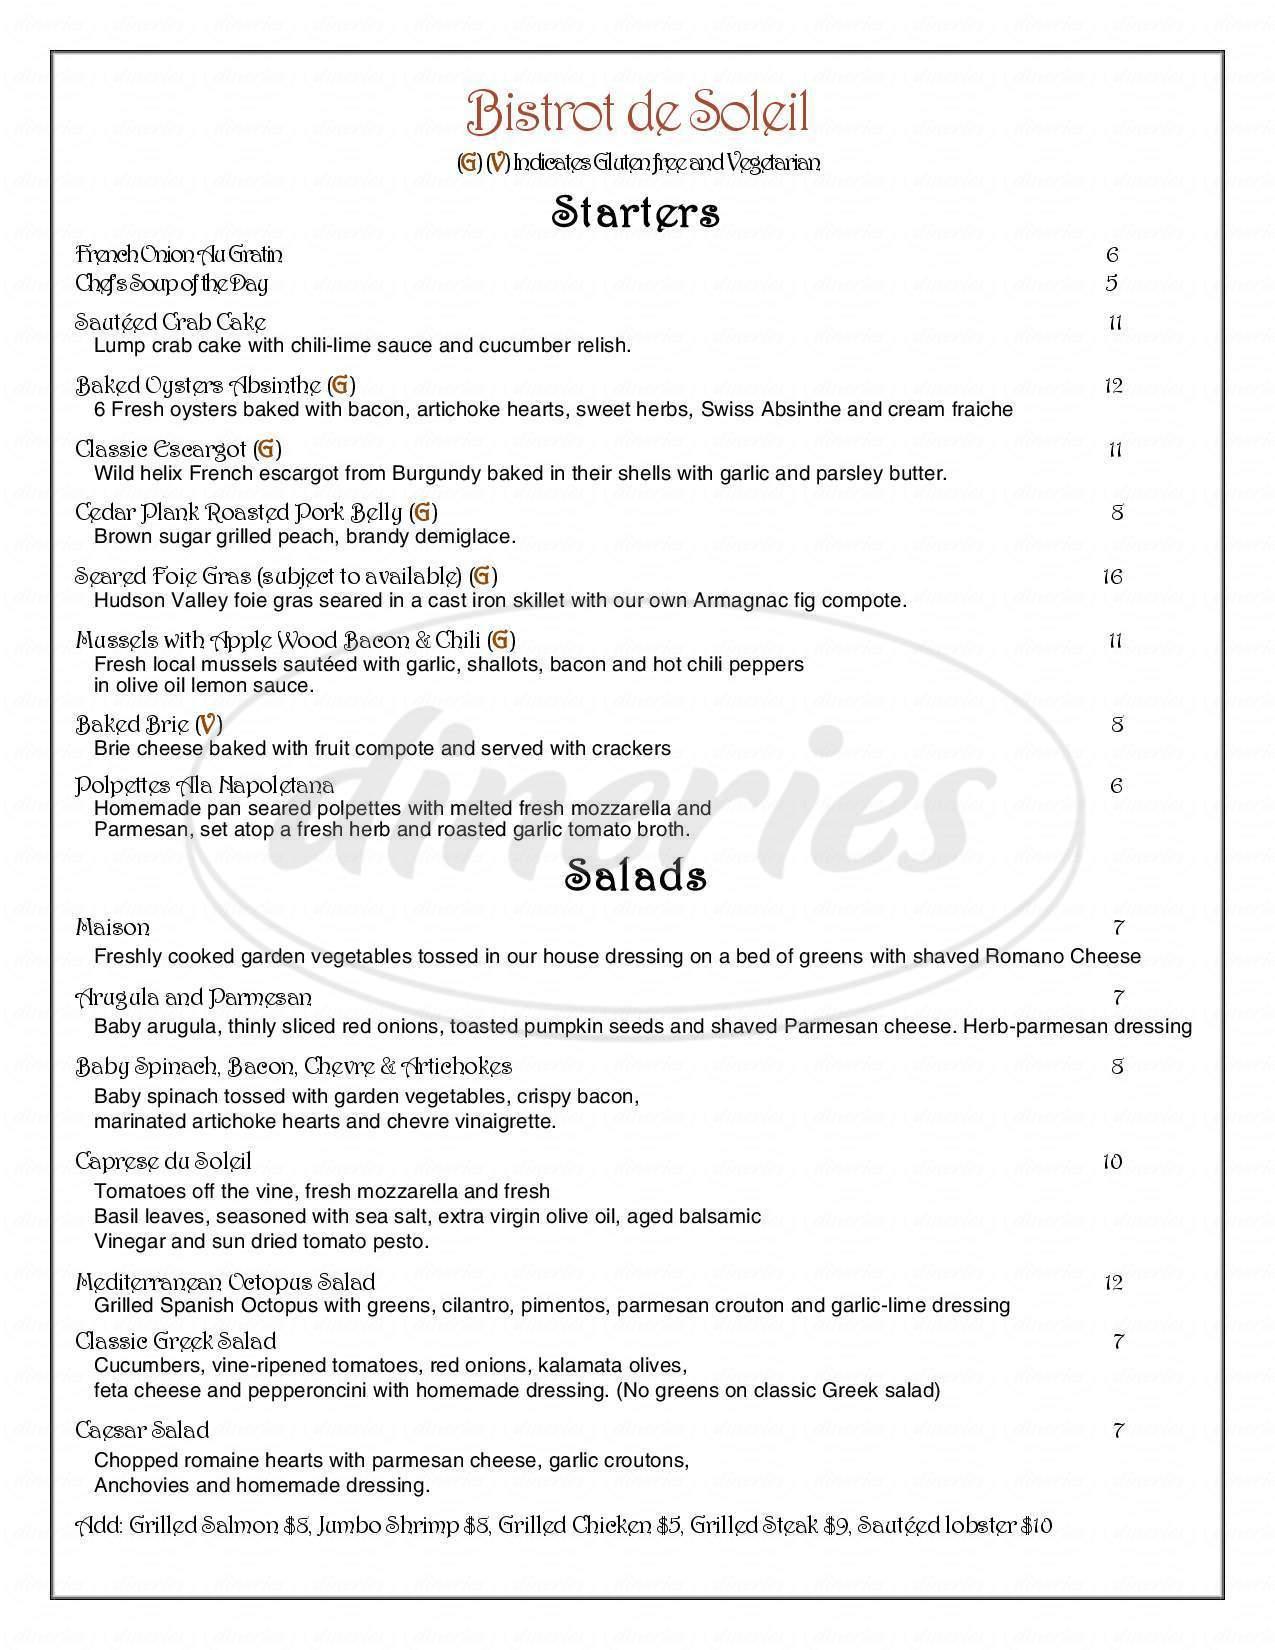 menu for Bistrot De Soleil